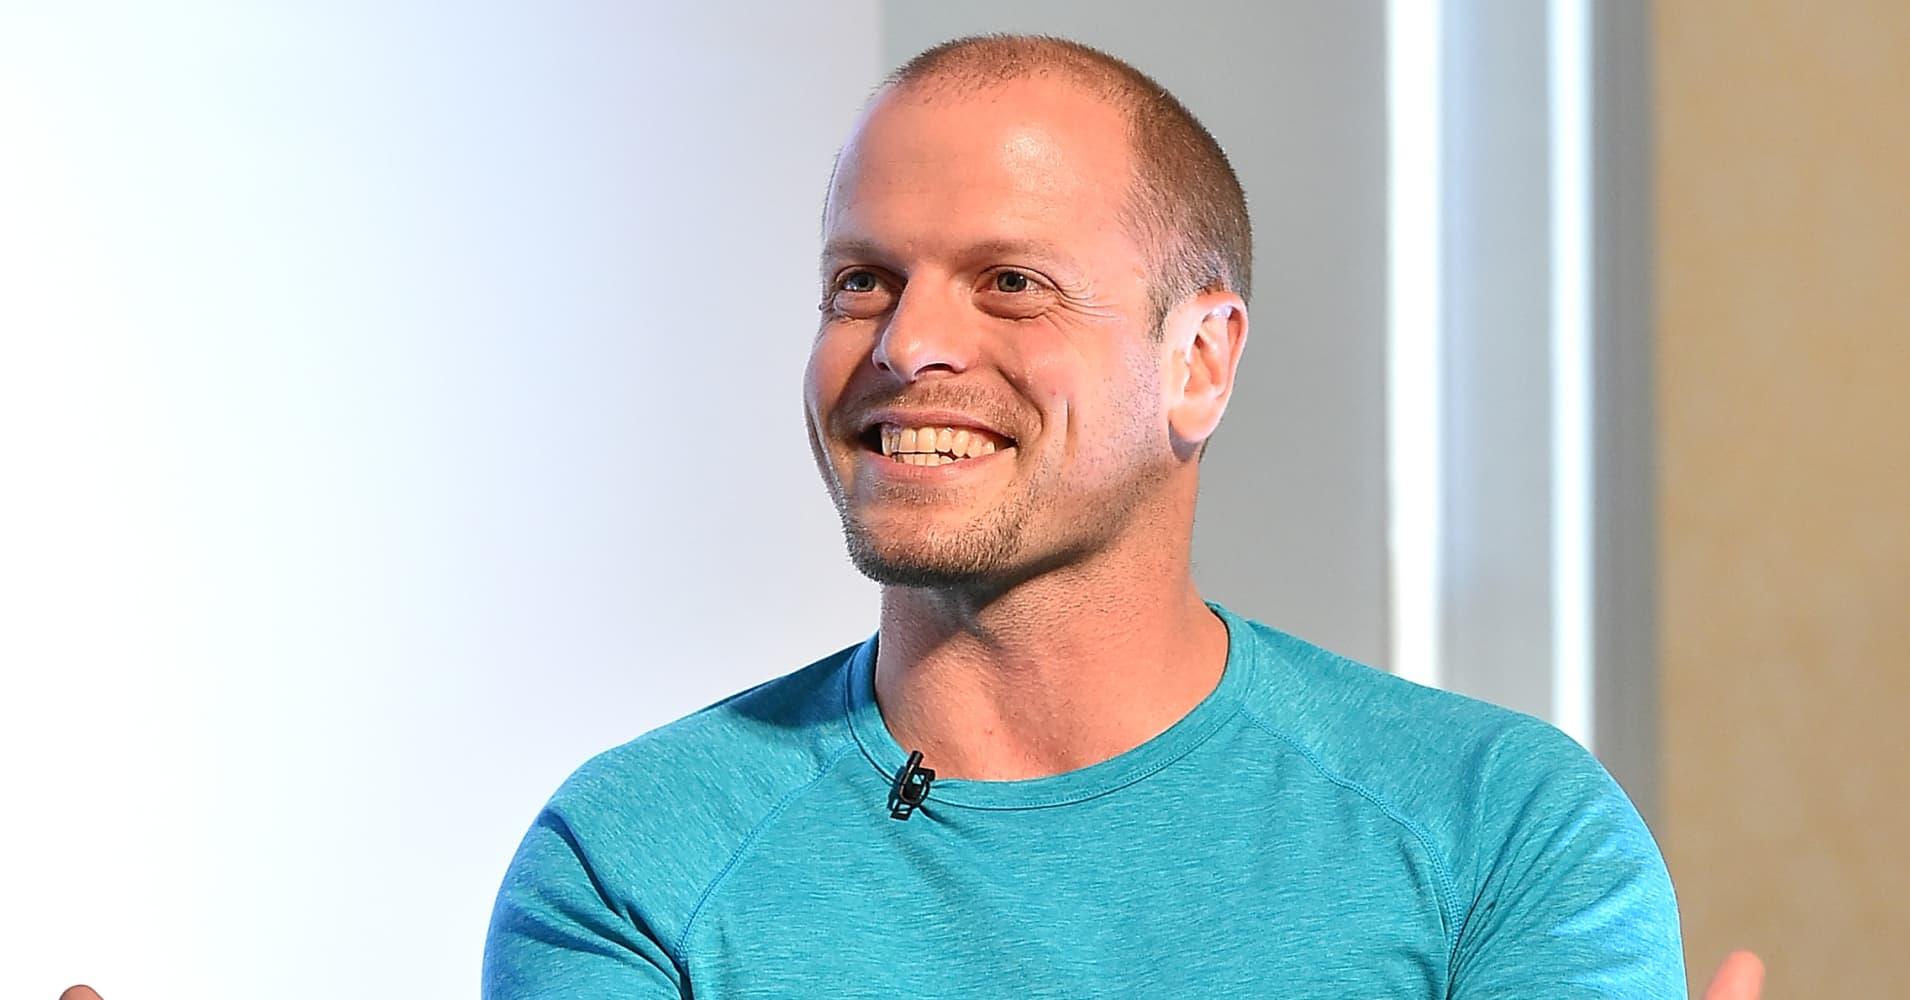 Author and entrepreneur Tim Ferriss